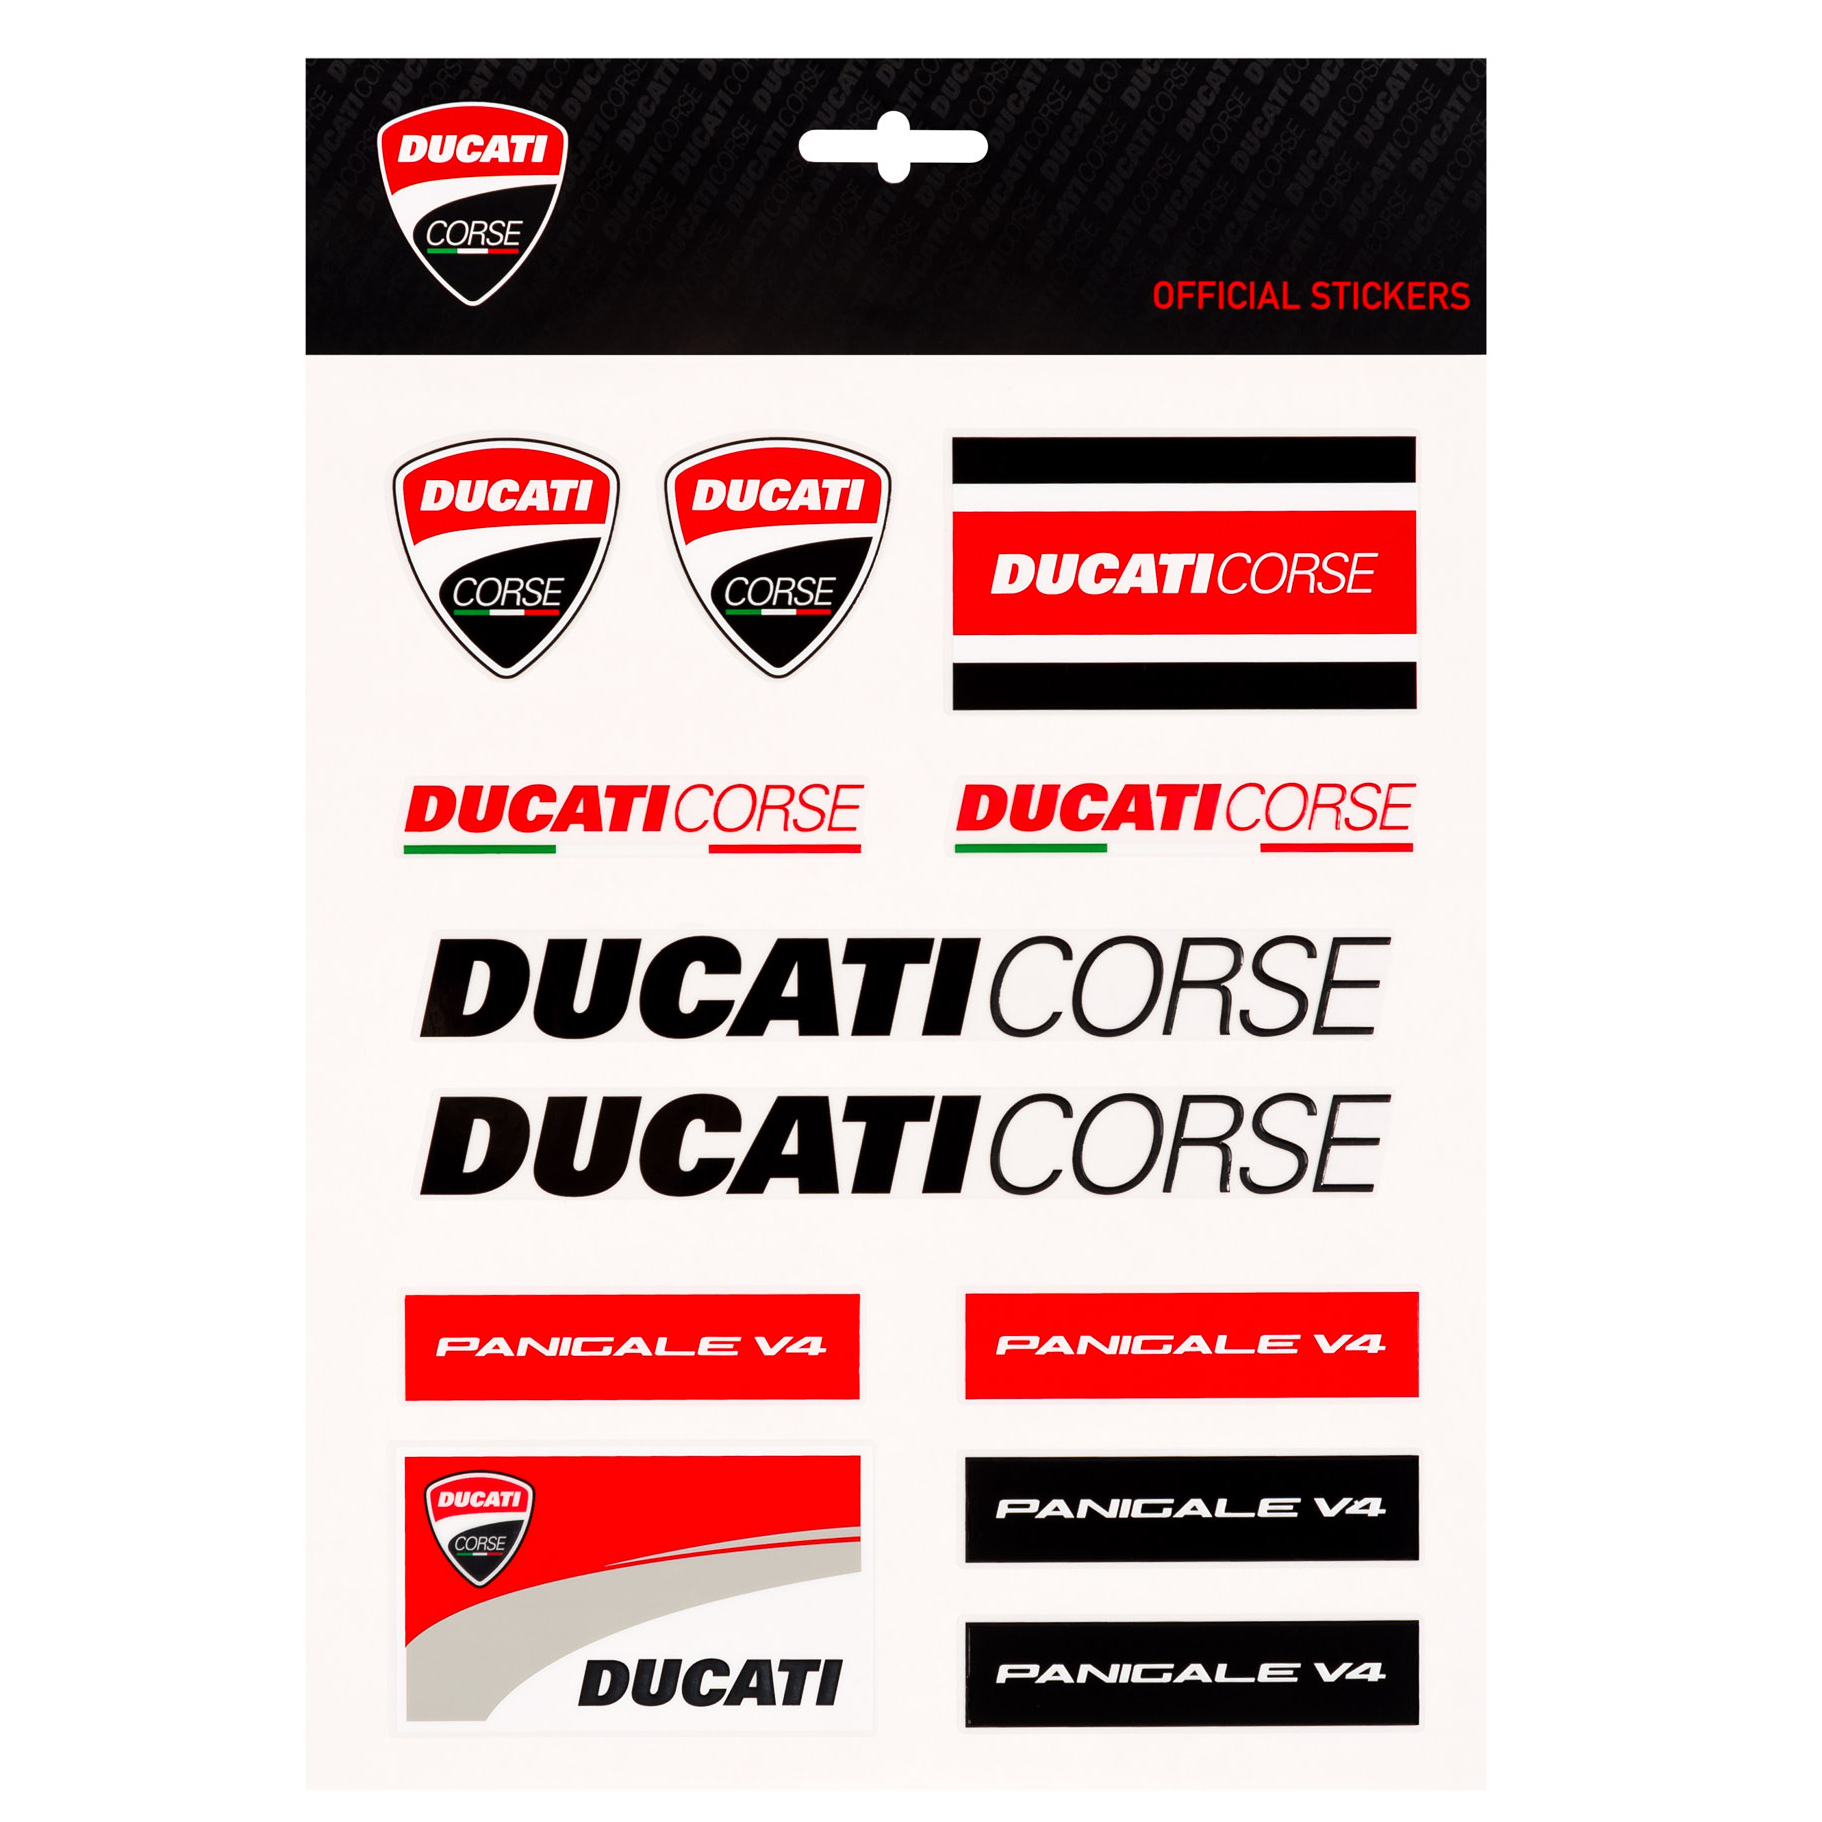 Details about 2019 ducati corse racing motogp large sticker sheet decals official merchandise